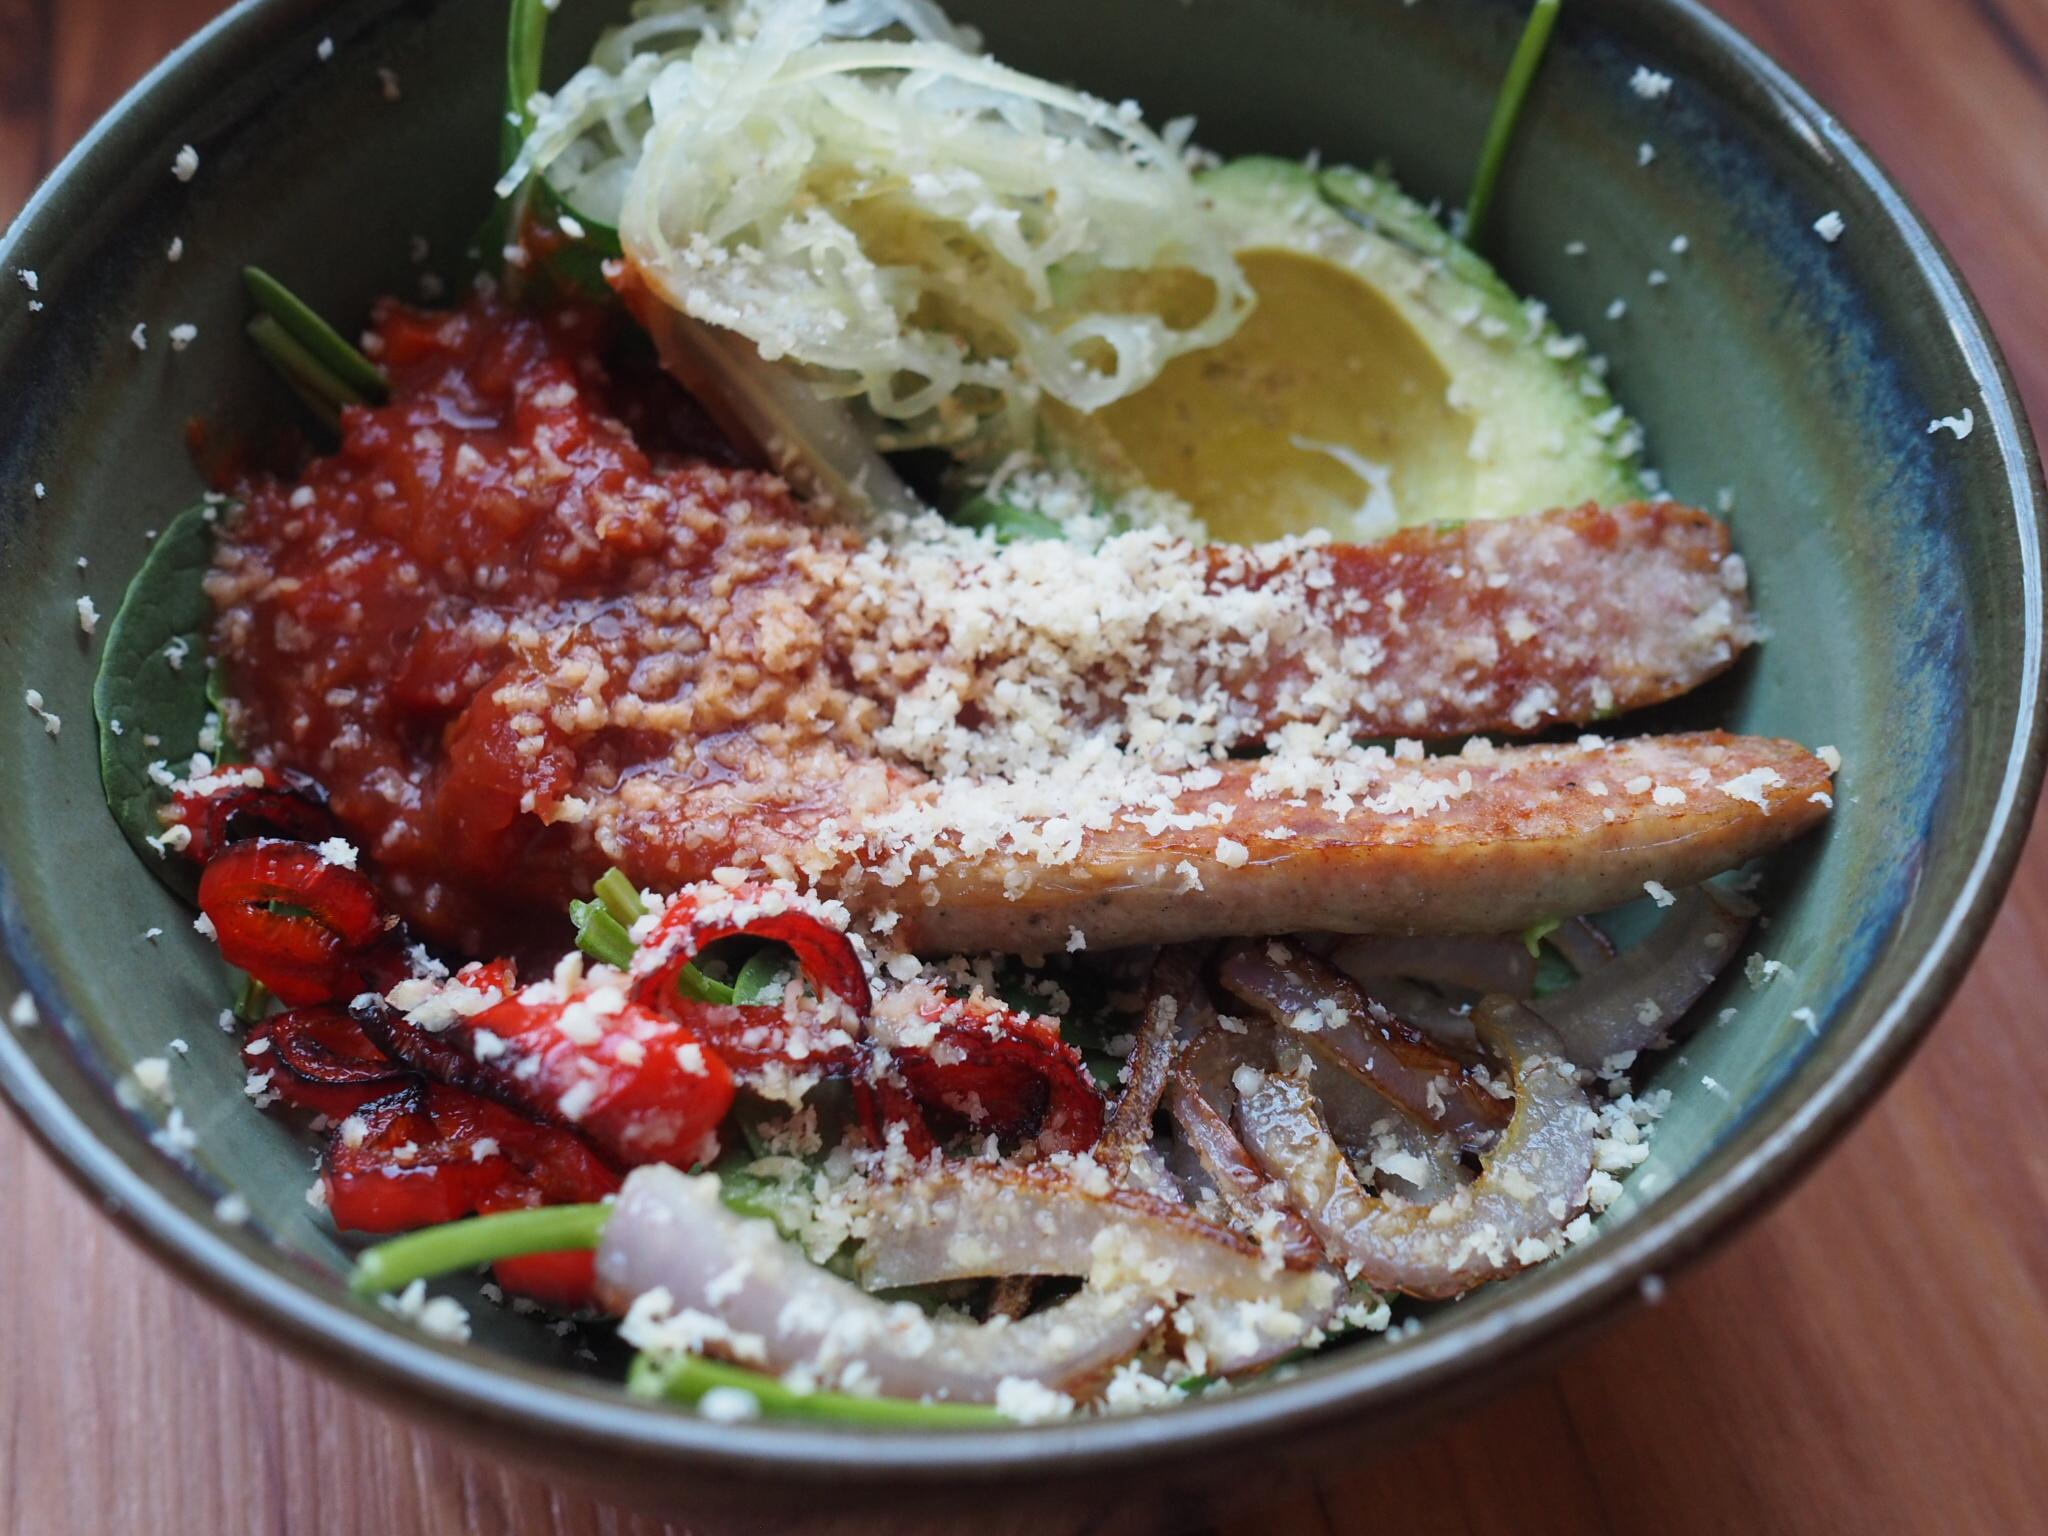 sausage bowl 2.JPG